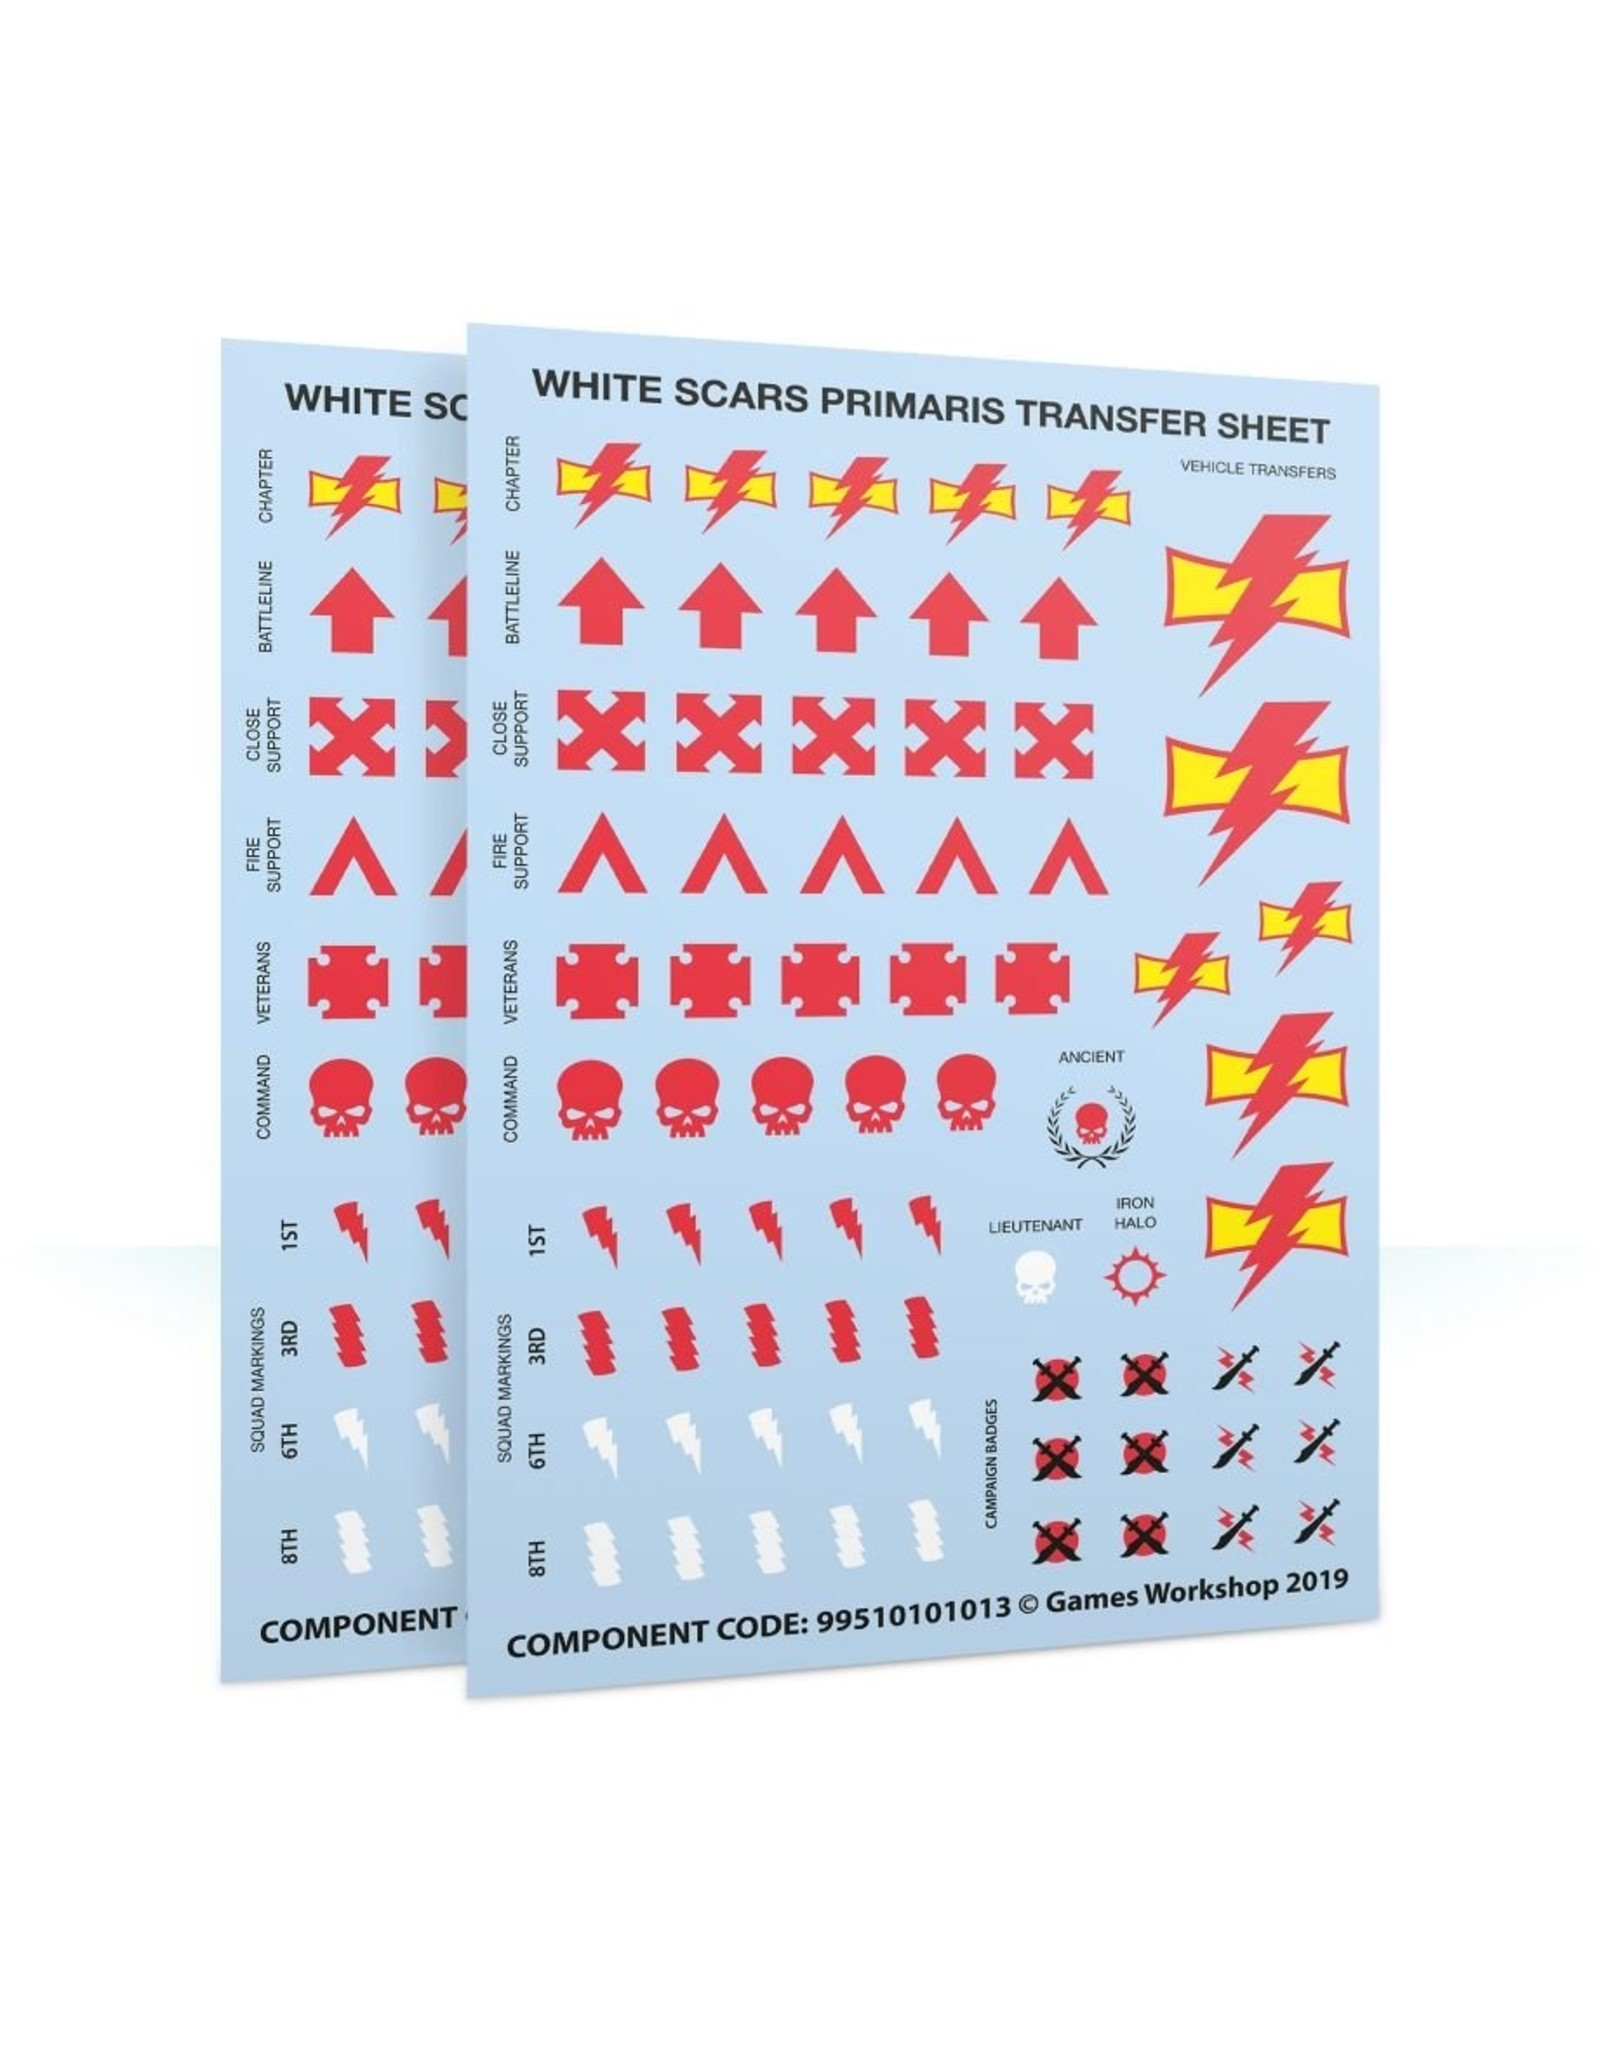 Games Workshop White Scars: Primaris Upgrades & Transfers